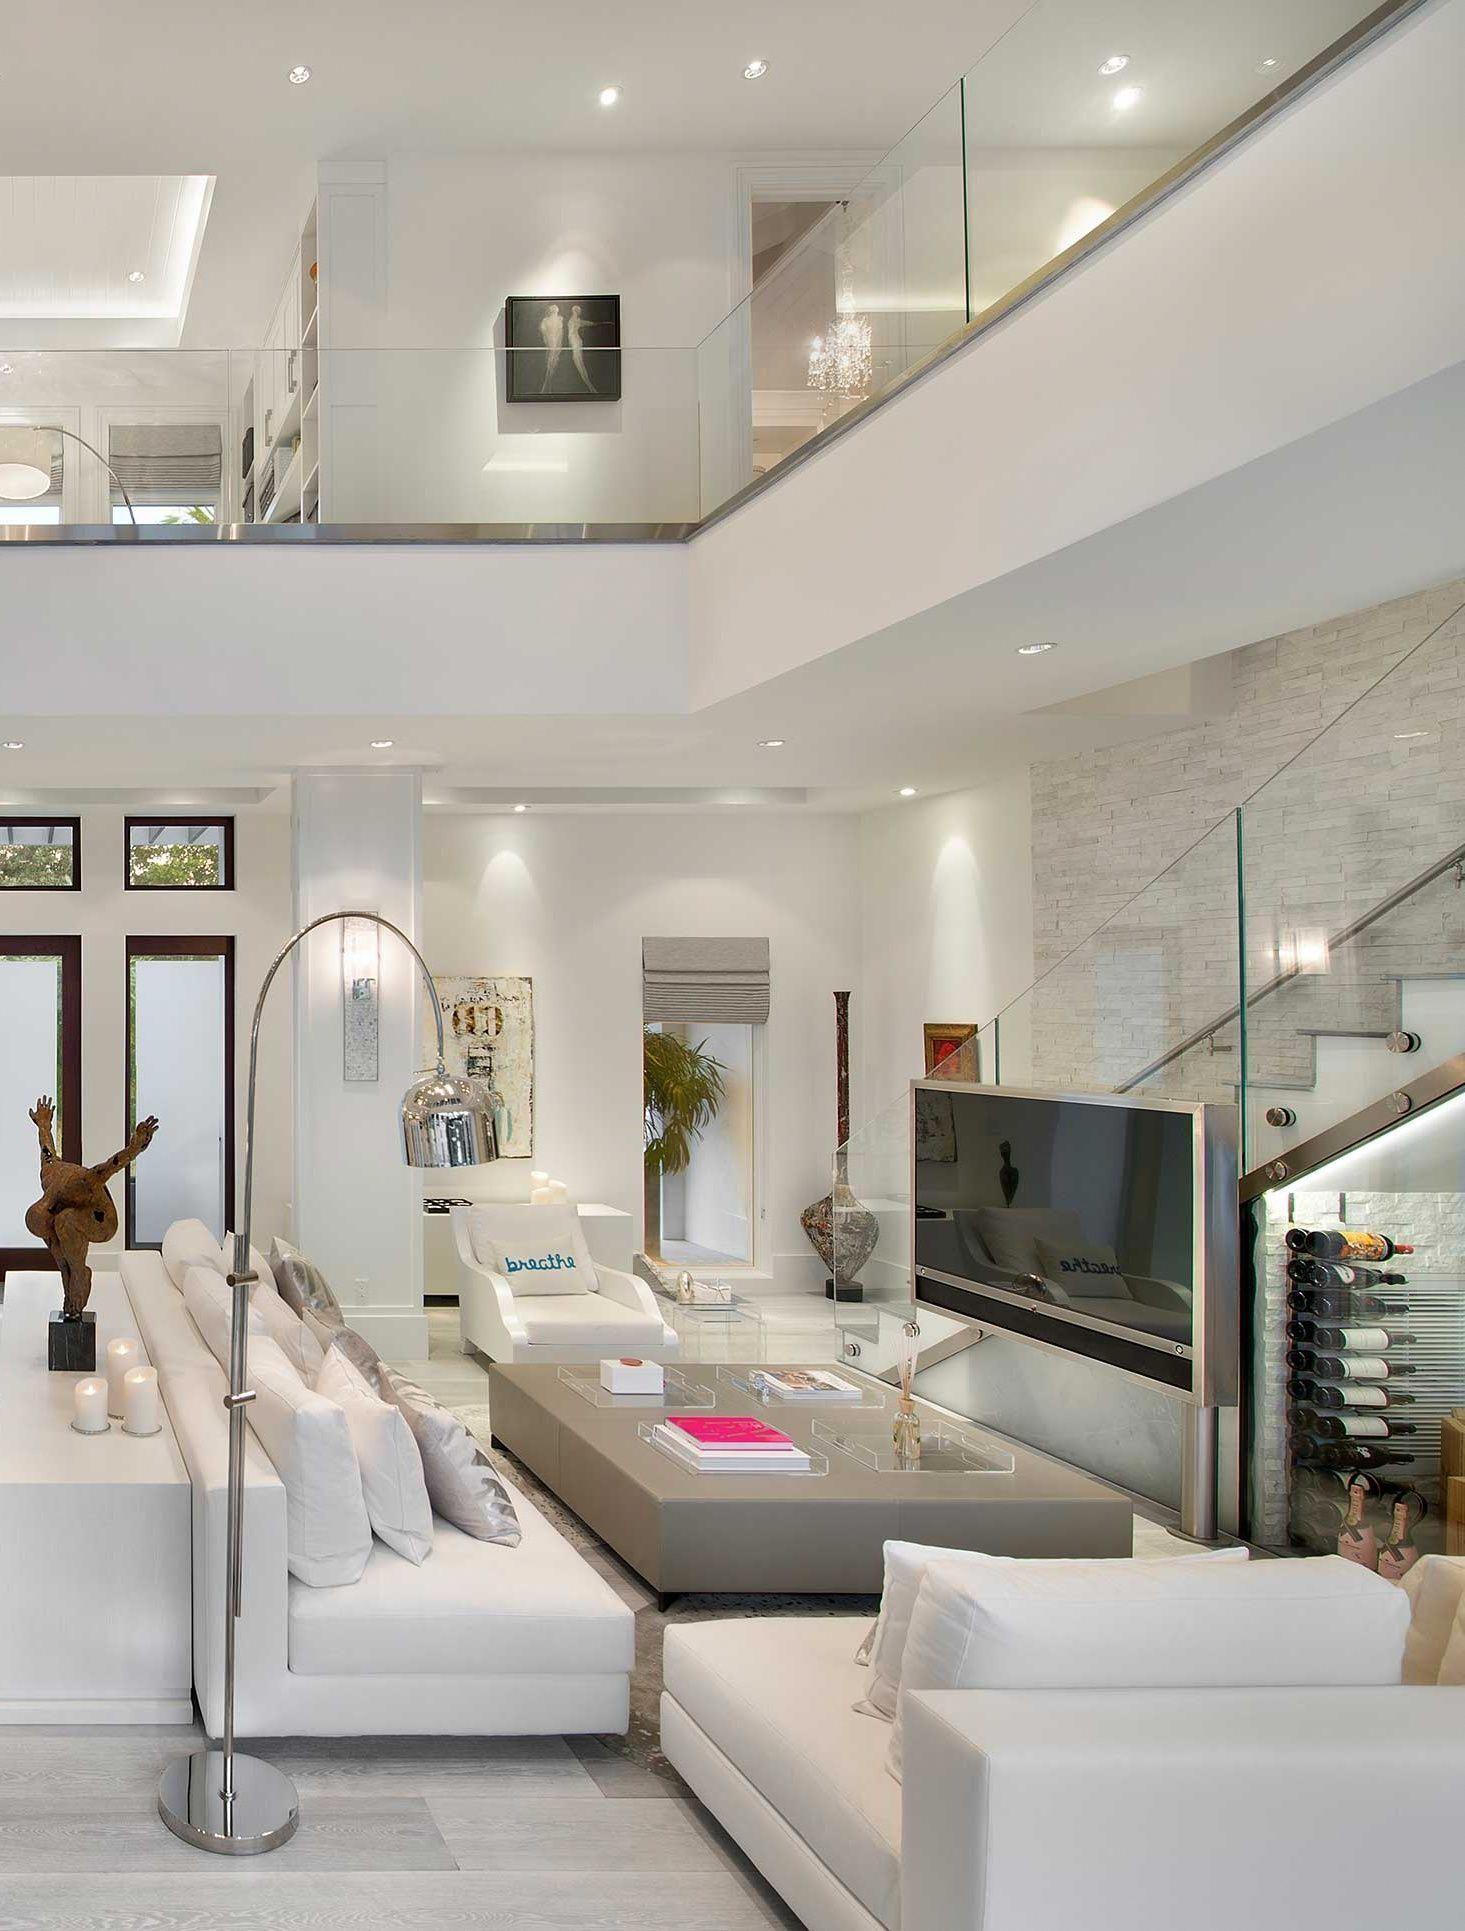 Interieur Maison Moderne Architecte 7th avenue north #contemporaryinteriordesign | interieur